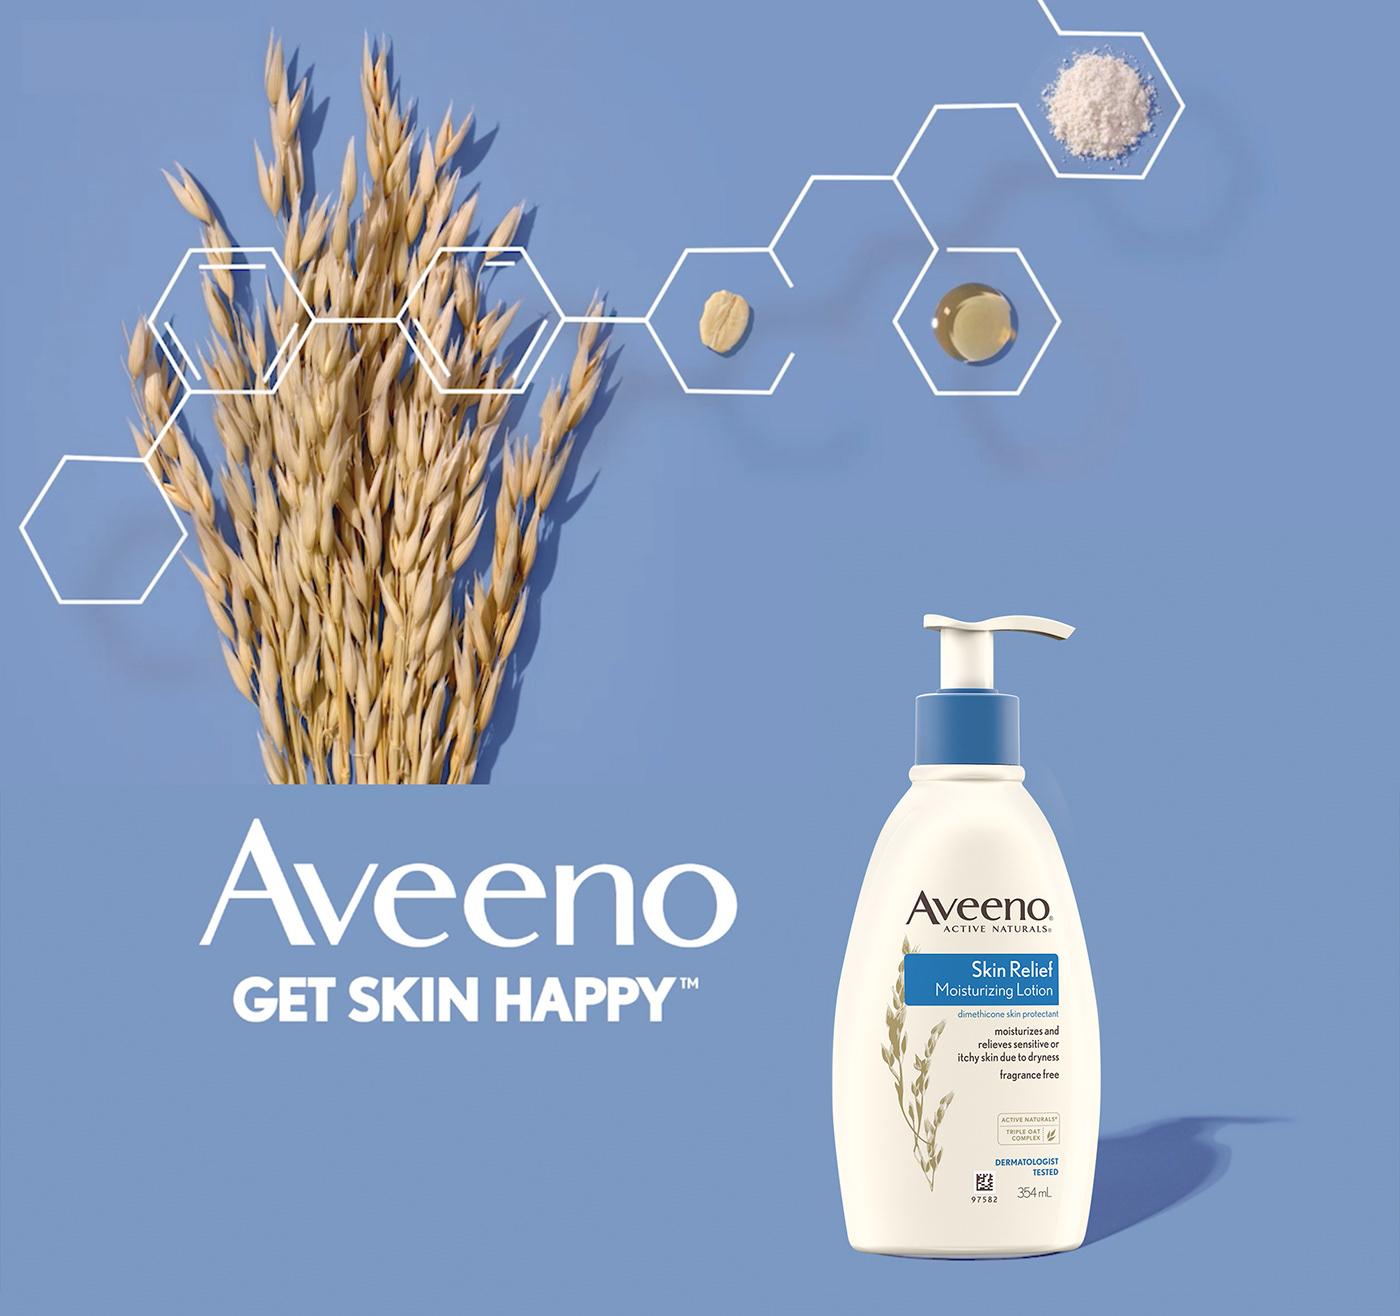 animation  aveeno Bacteria hygiene Johnson & Johnson motiongraphics singapore skin virus